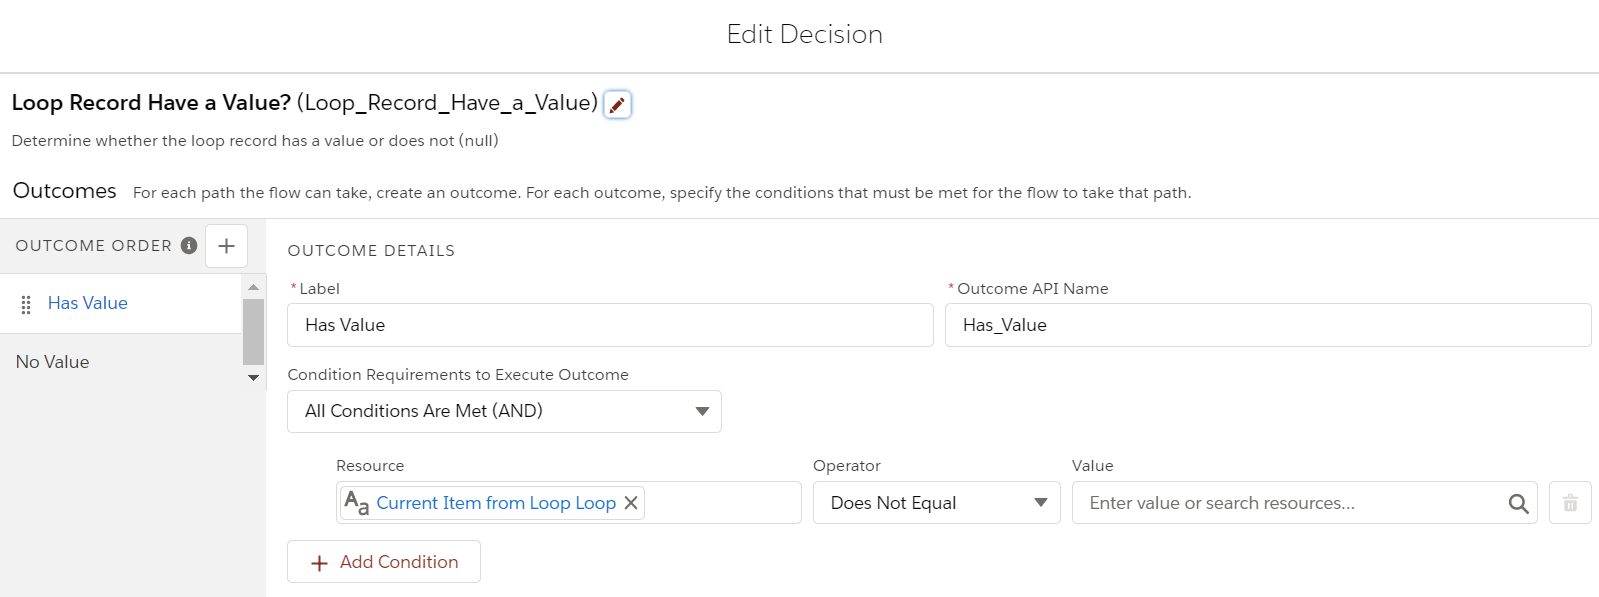 CloneaTaskforMultipleAccountFlow-Decision